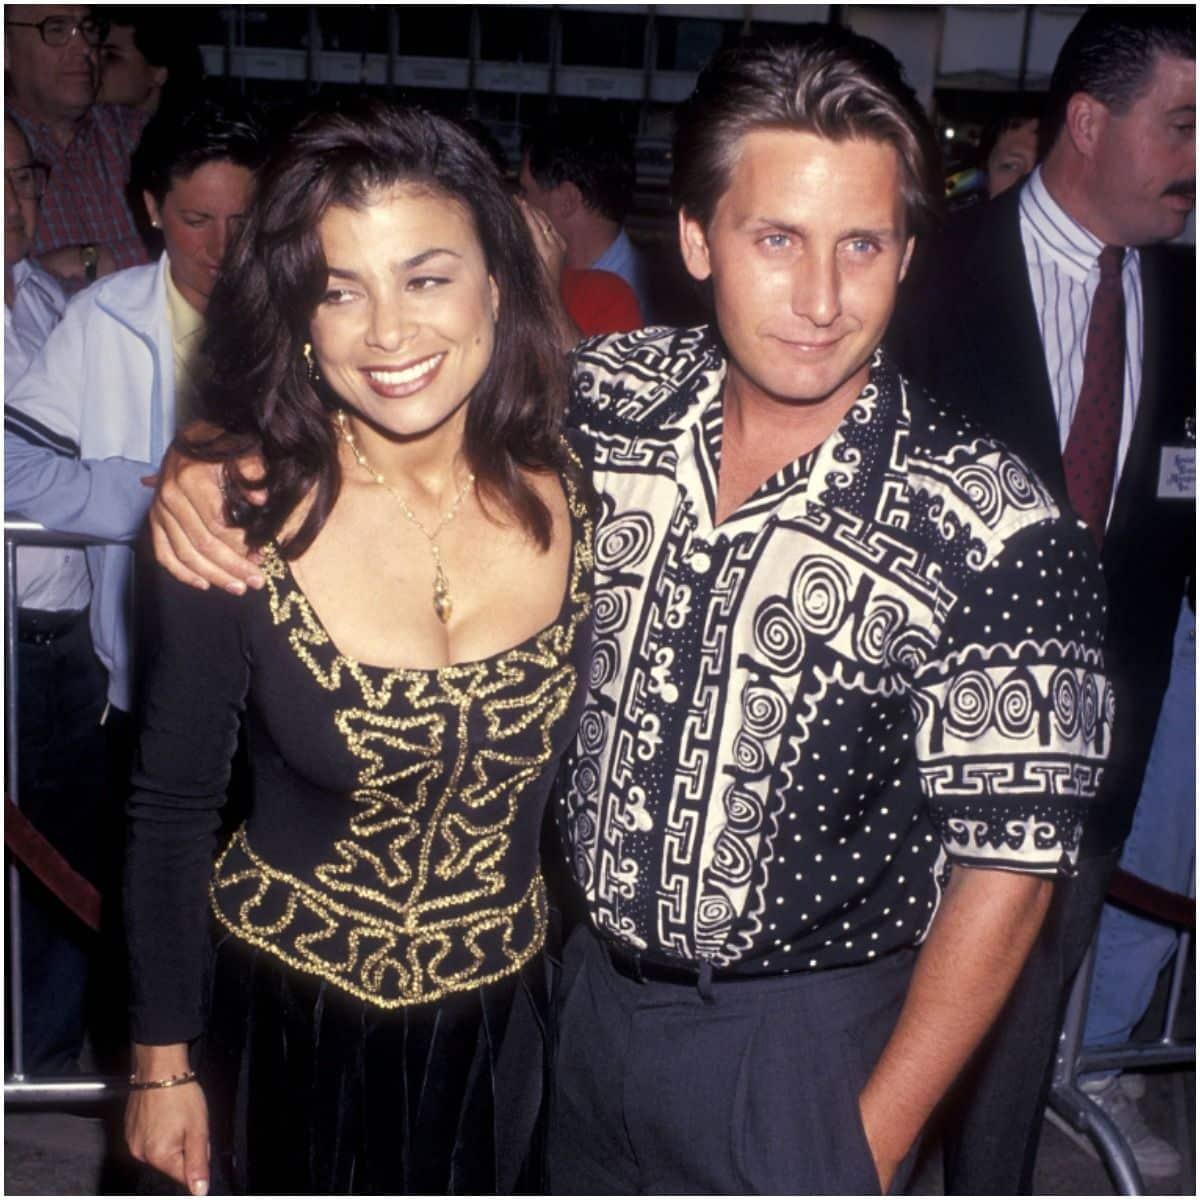 Paula Abdul and husband Emilio Estevez